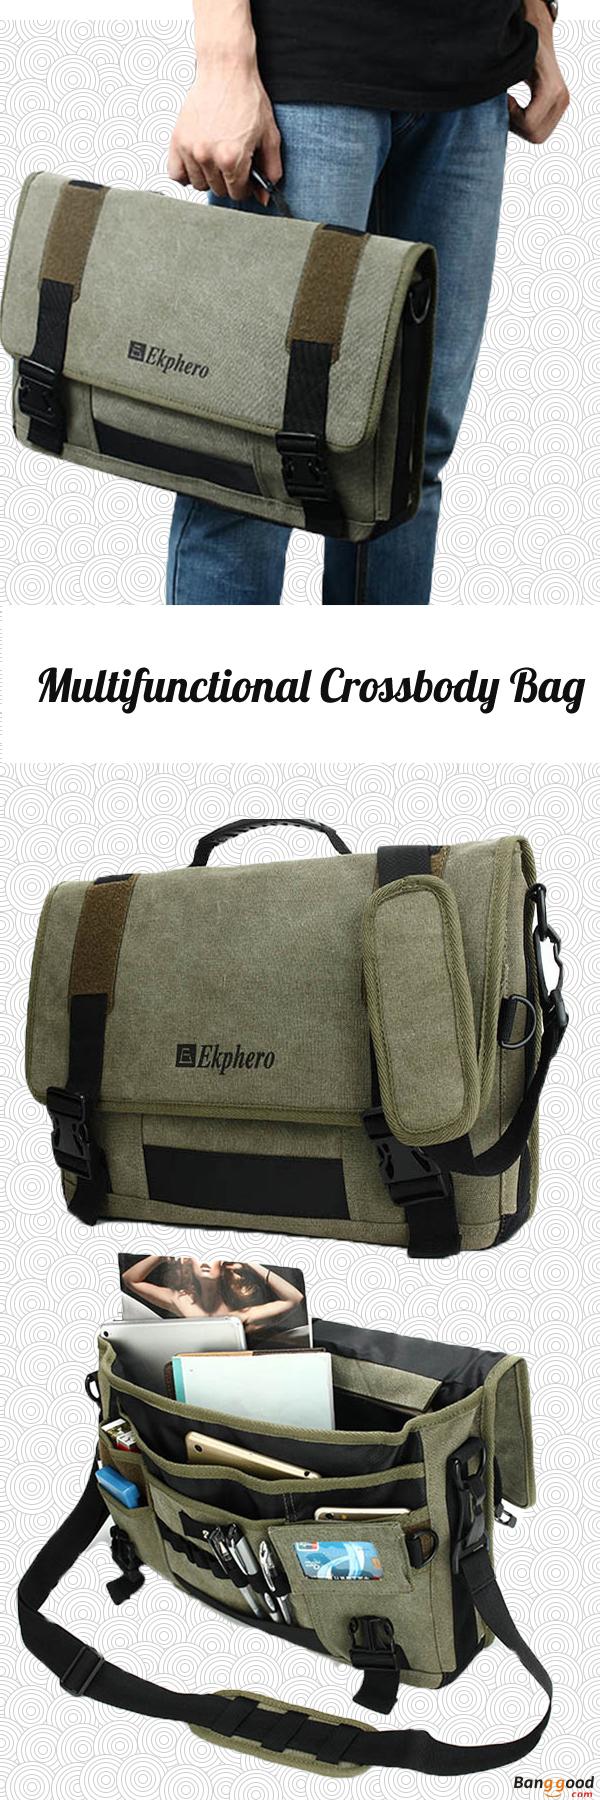 Men Canvas Multifunctional Big Capacity Outdoor 17.3 Inch Laptop Crossbody Bag  Handbag. Older Mens FashionTrendy ... cb48225f4d8dc